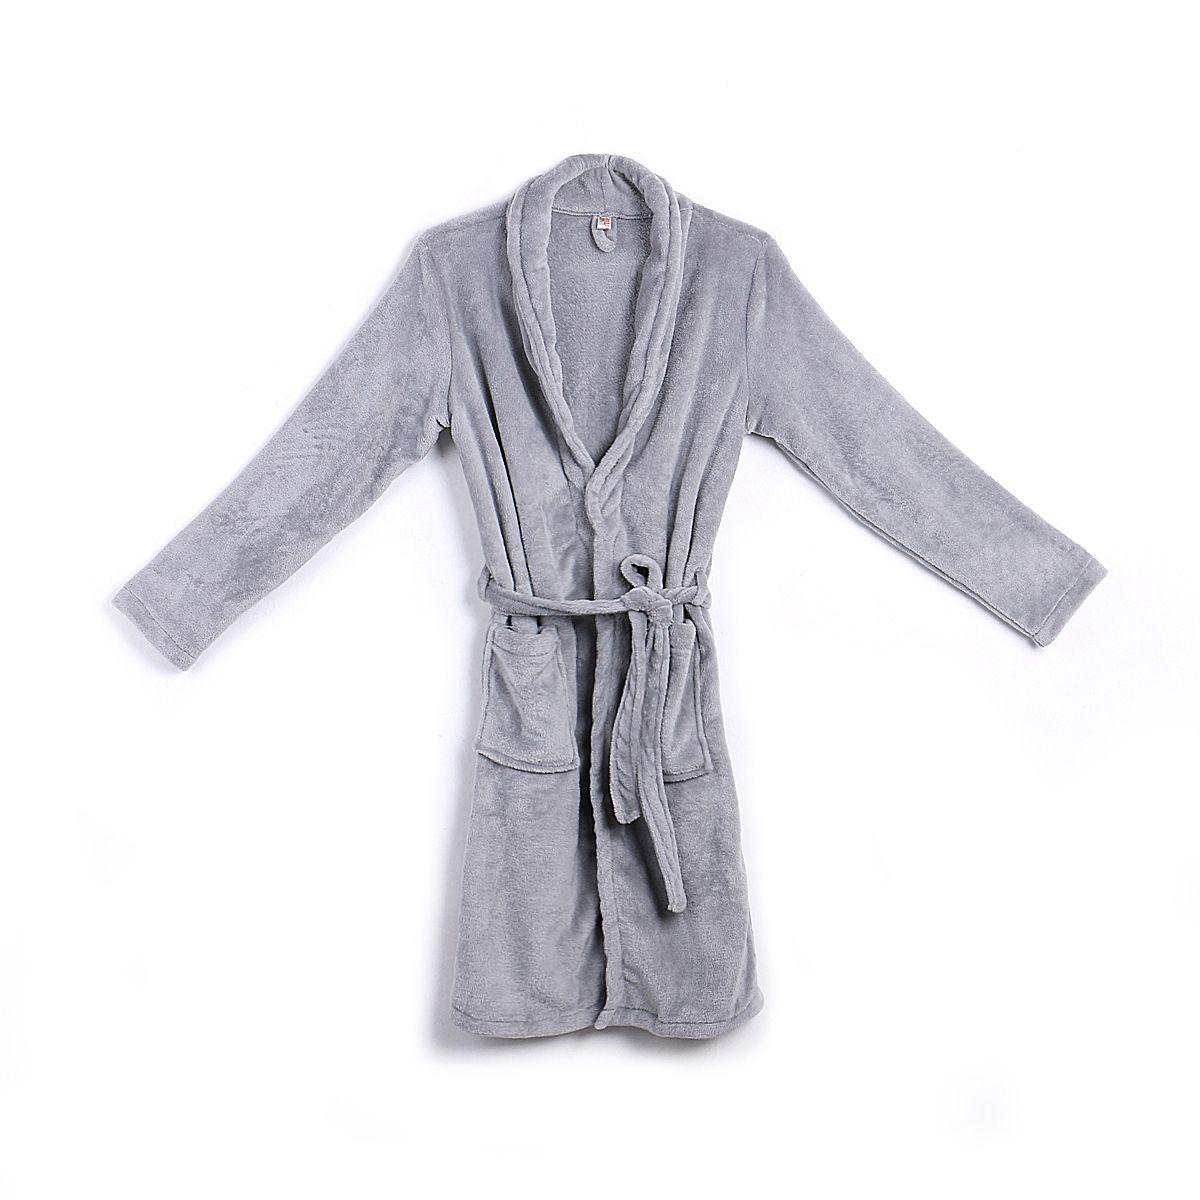 Men/'s Long Sleepwear Robes Shawl Collar Coral Fleece Bathrobe Spa Pajamas Soft